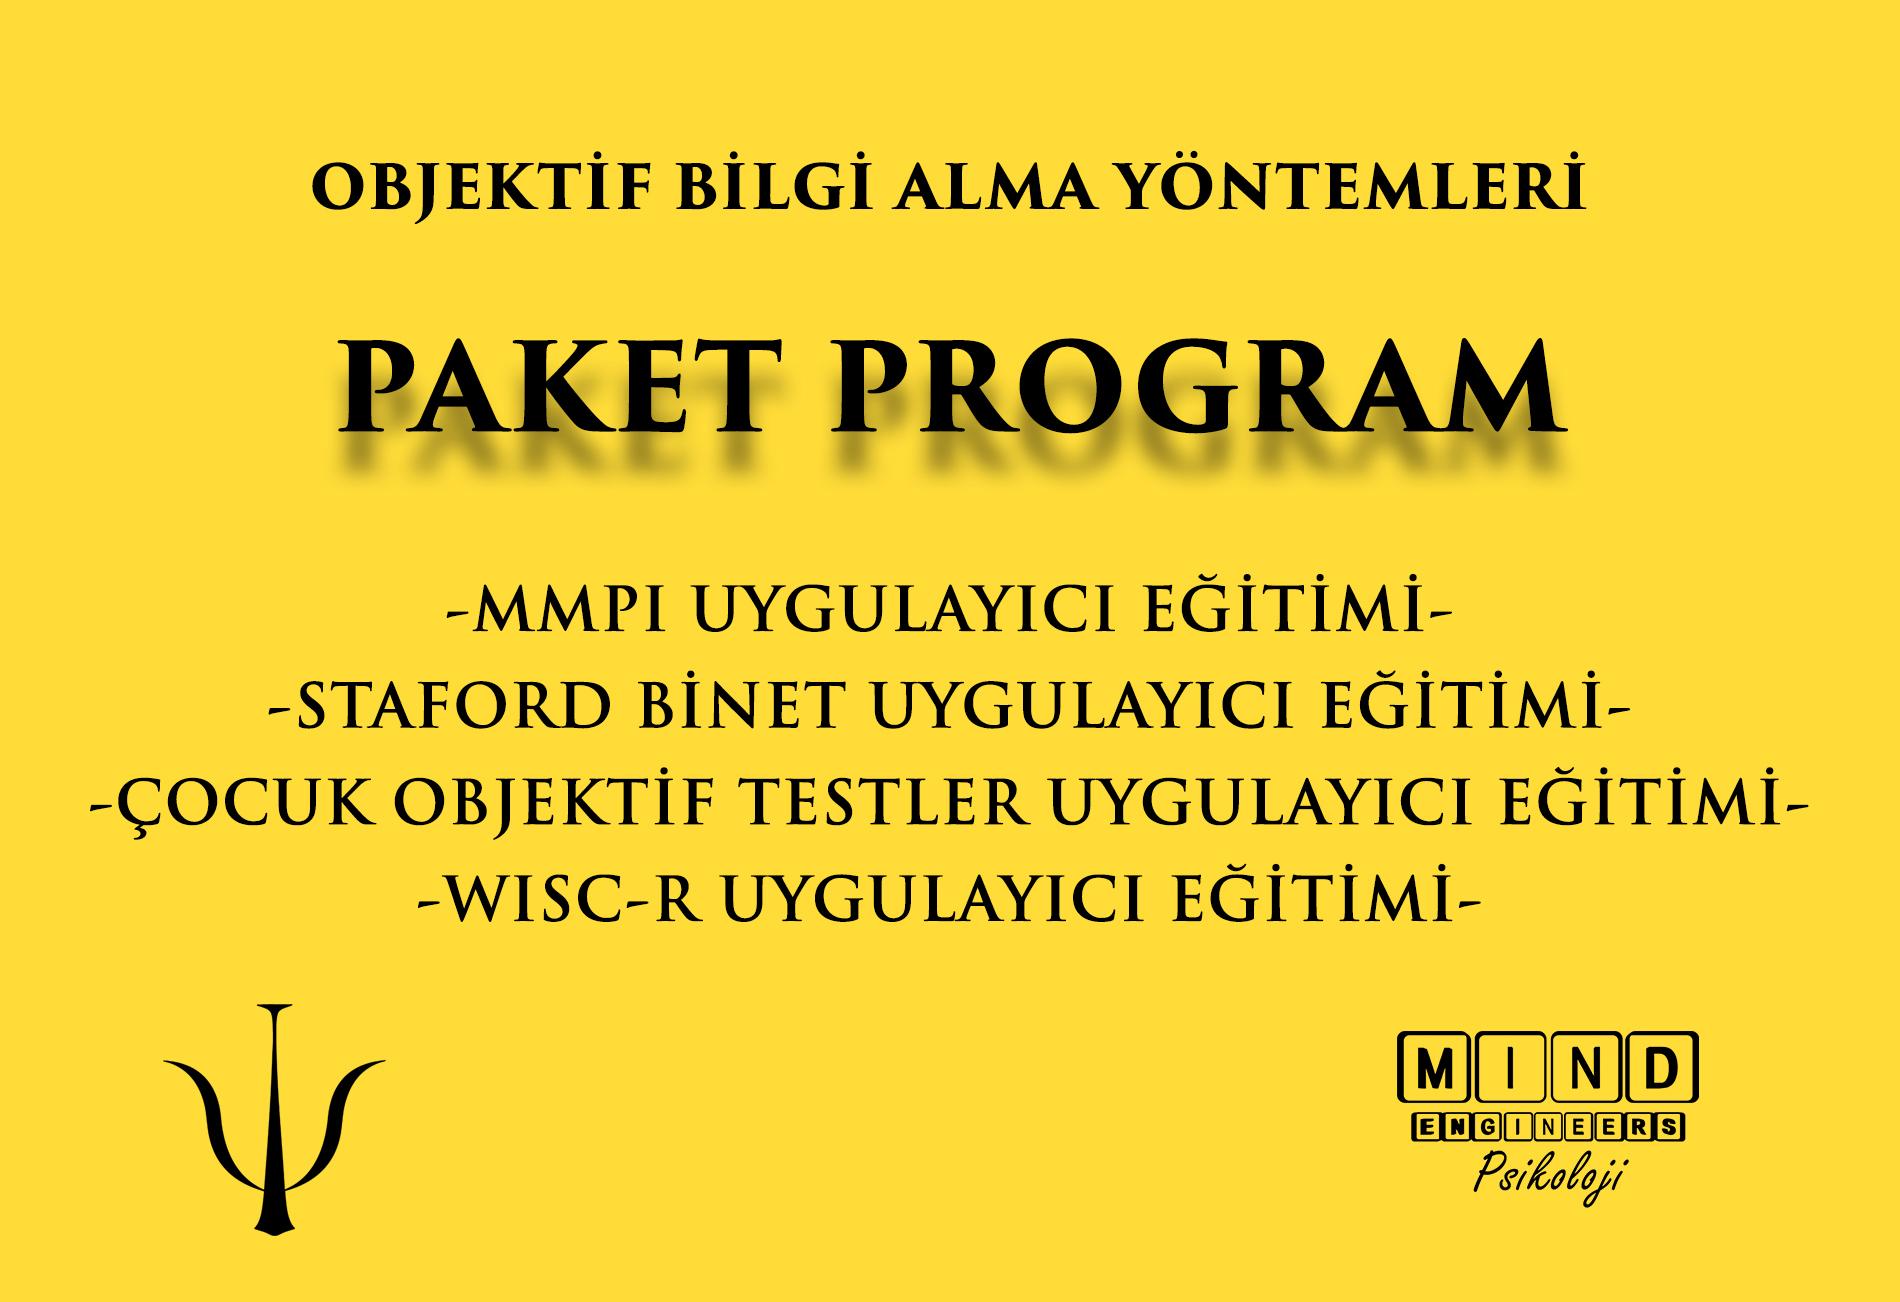 paketprogram-(1).jpg